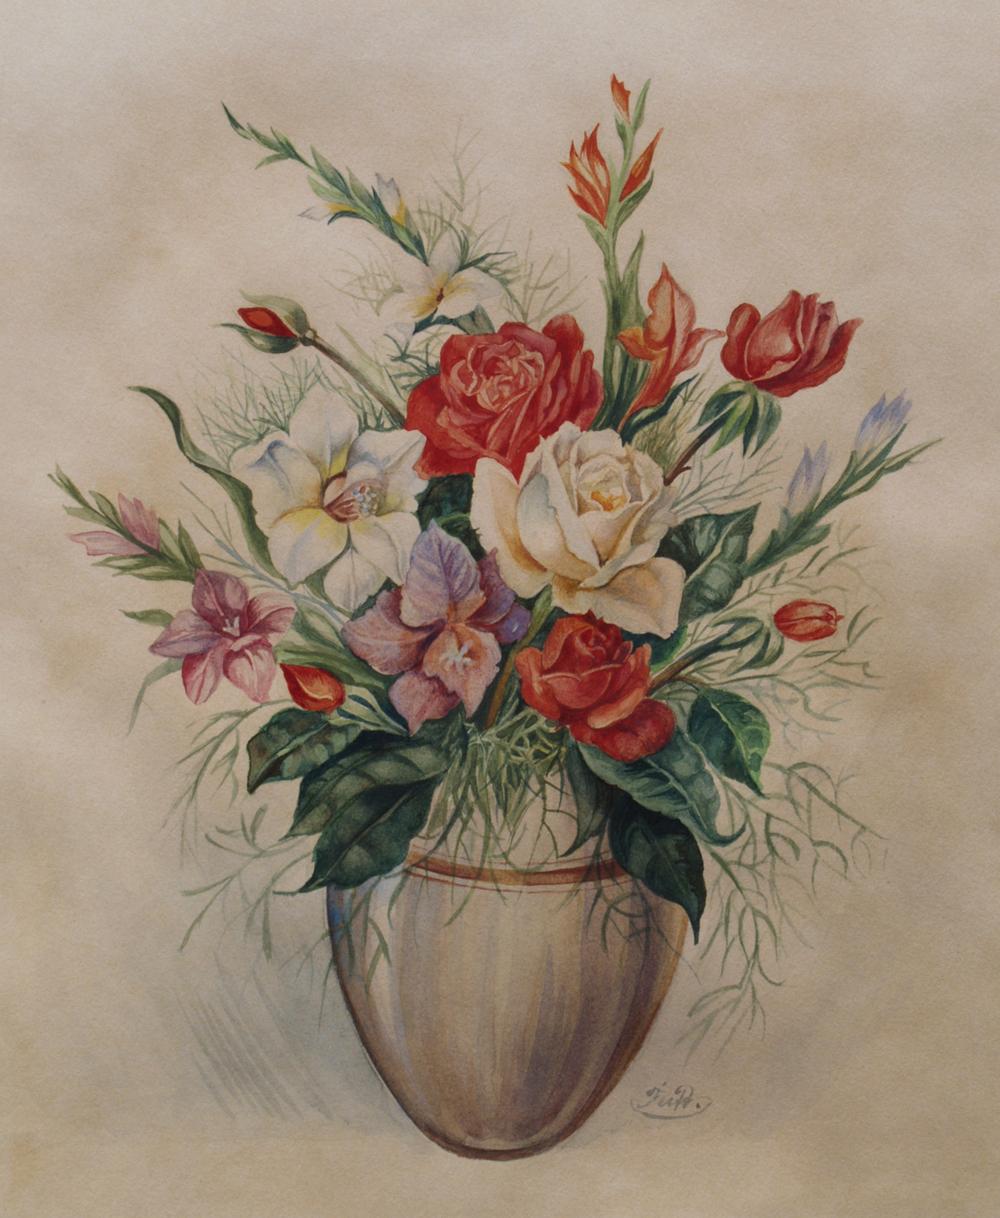 rosen in vase signiert feidt ca 1950 ebay. Black Bedroom Furniture Sets. Home Design Ideas